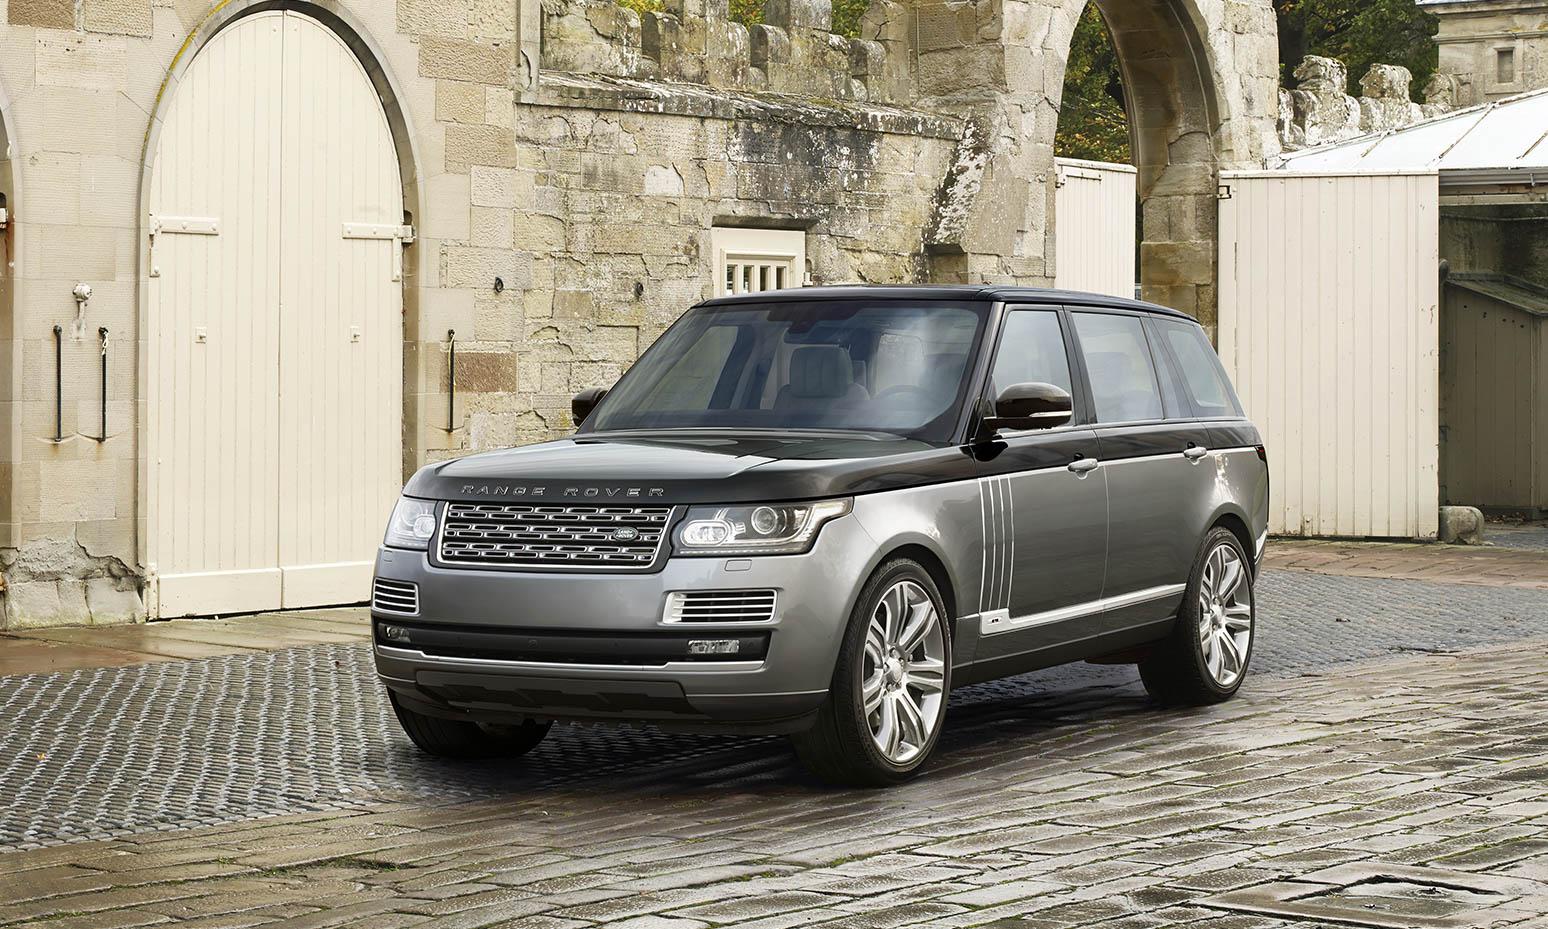 © Jaguar Land Rover Ltd